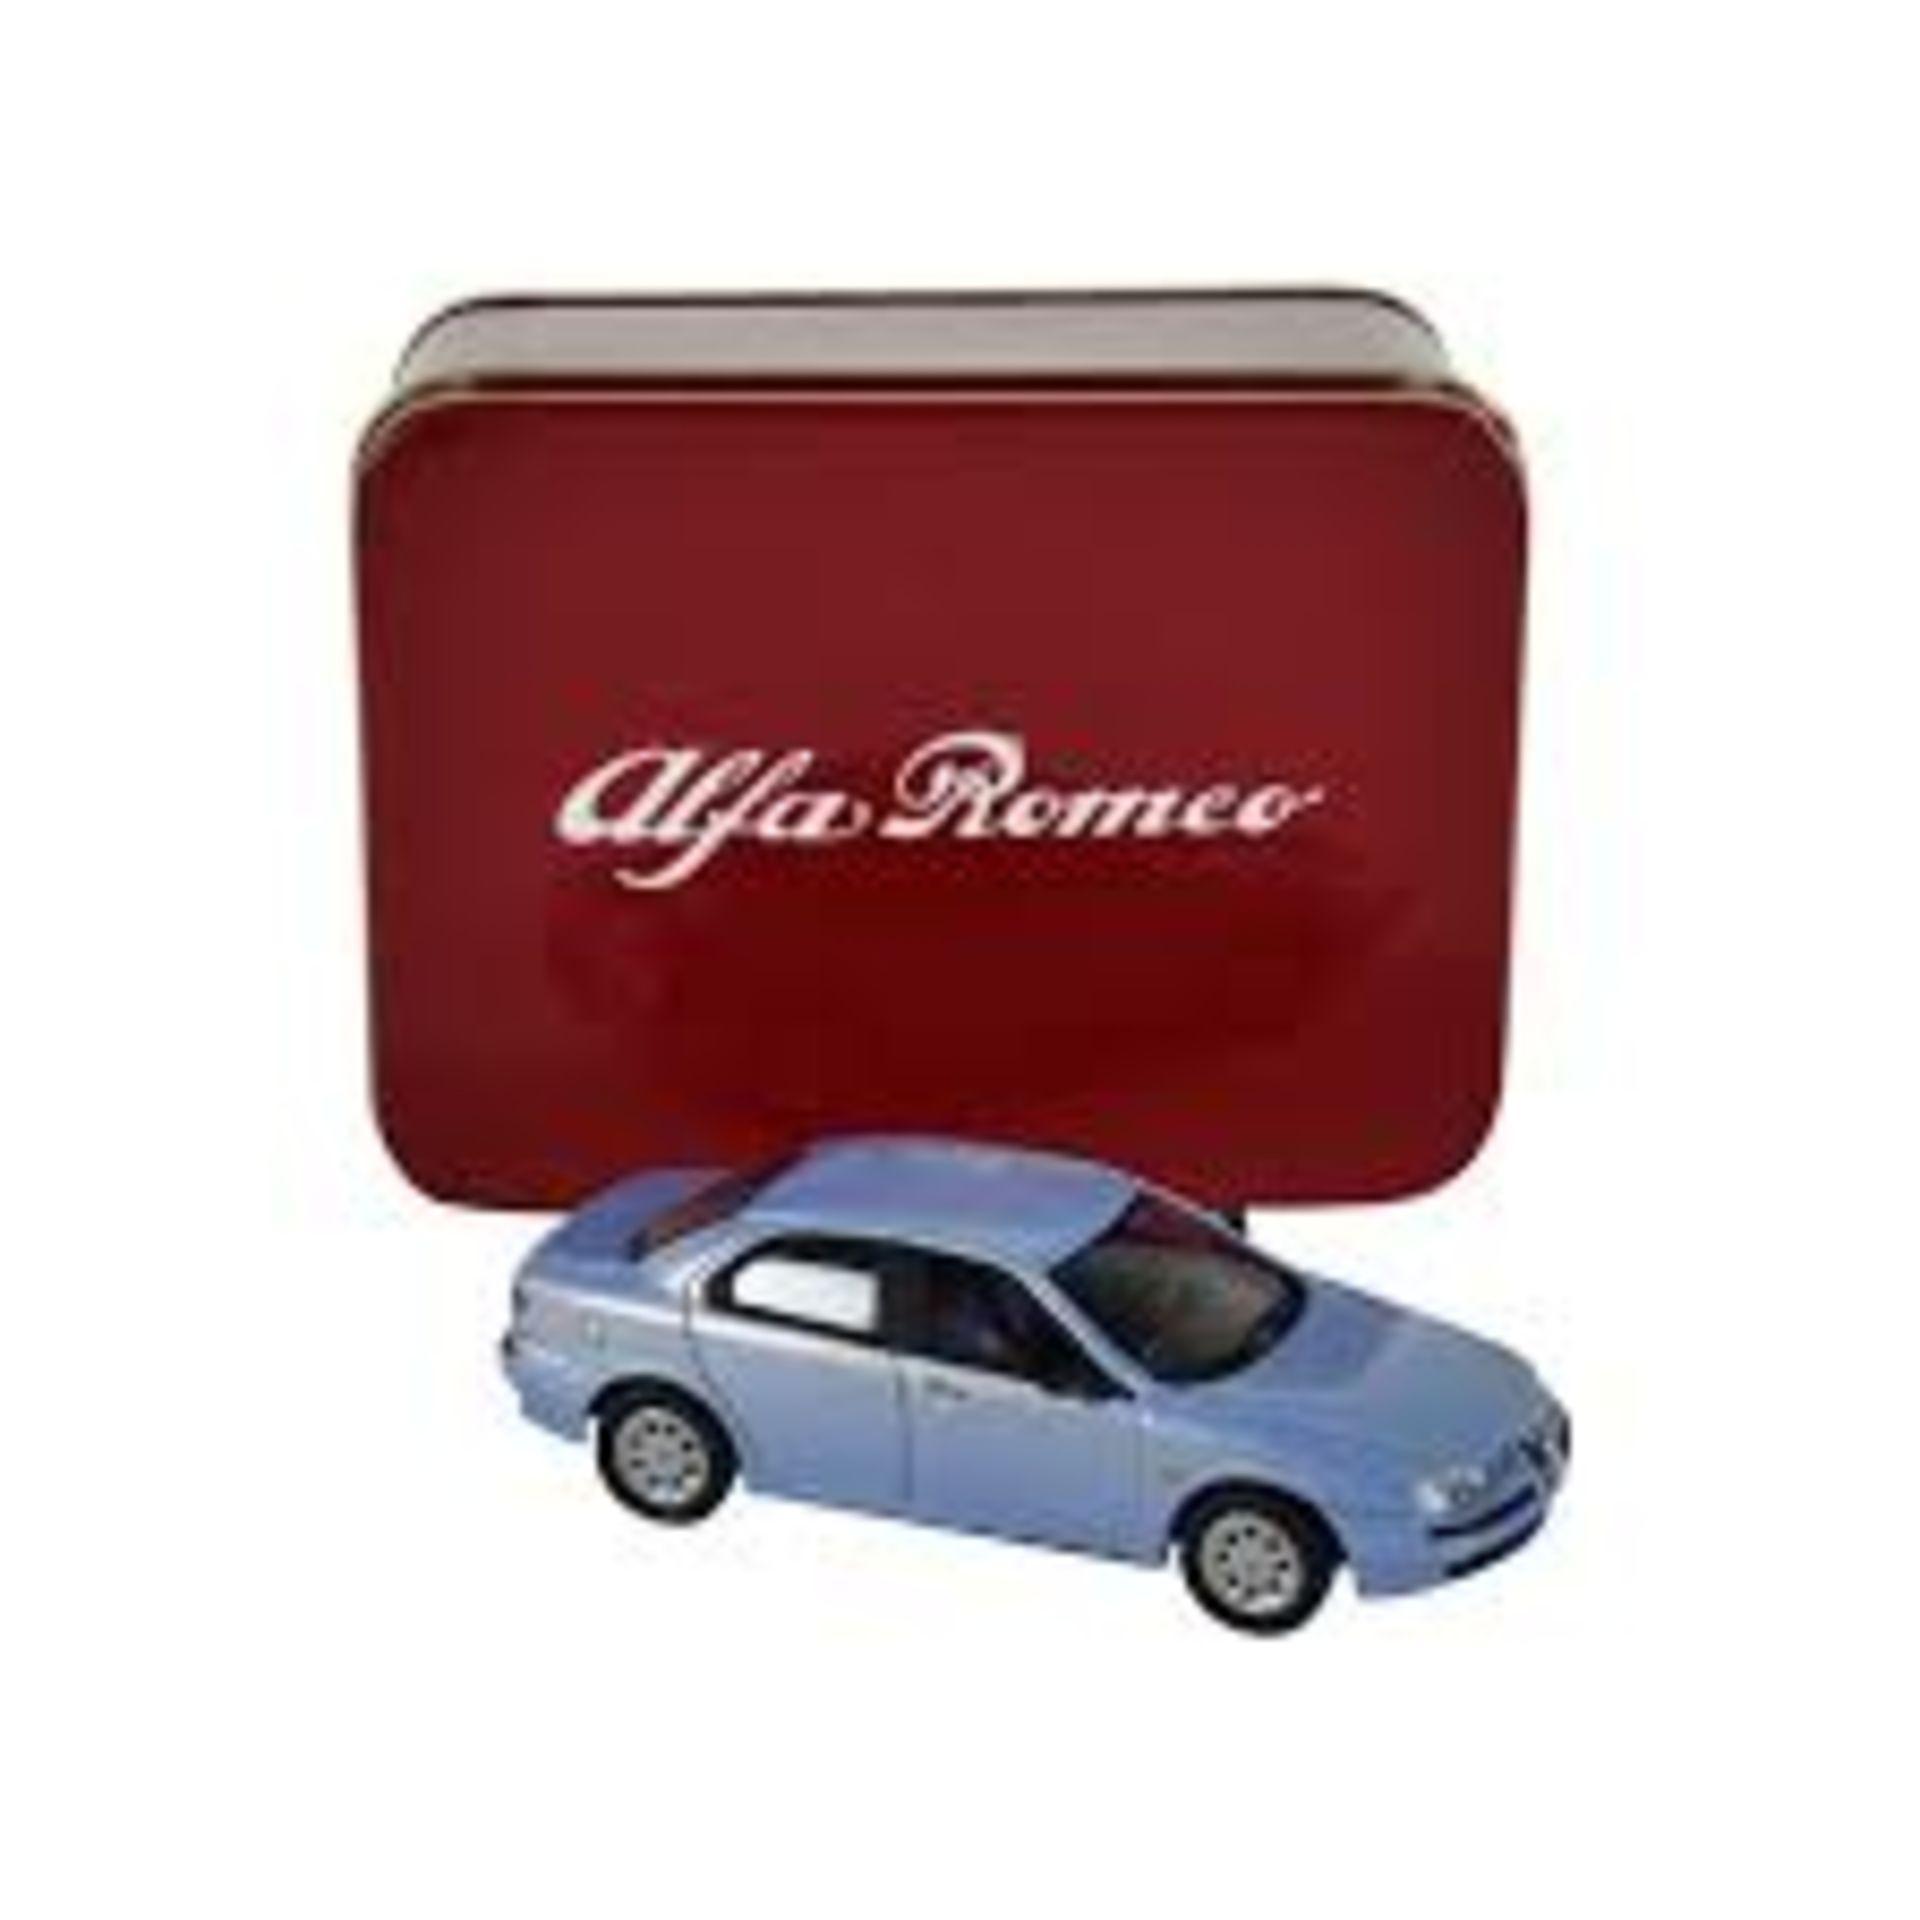 Lot 10361 - V Brand New 1/43 Diecast 1998 Alfa Romeo 156 - eBay Price £16.99